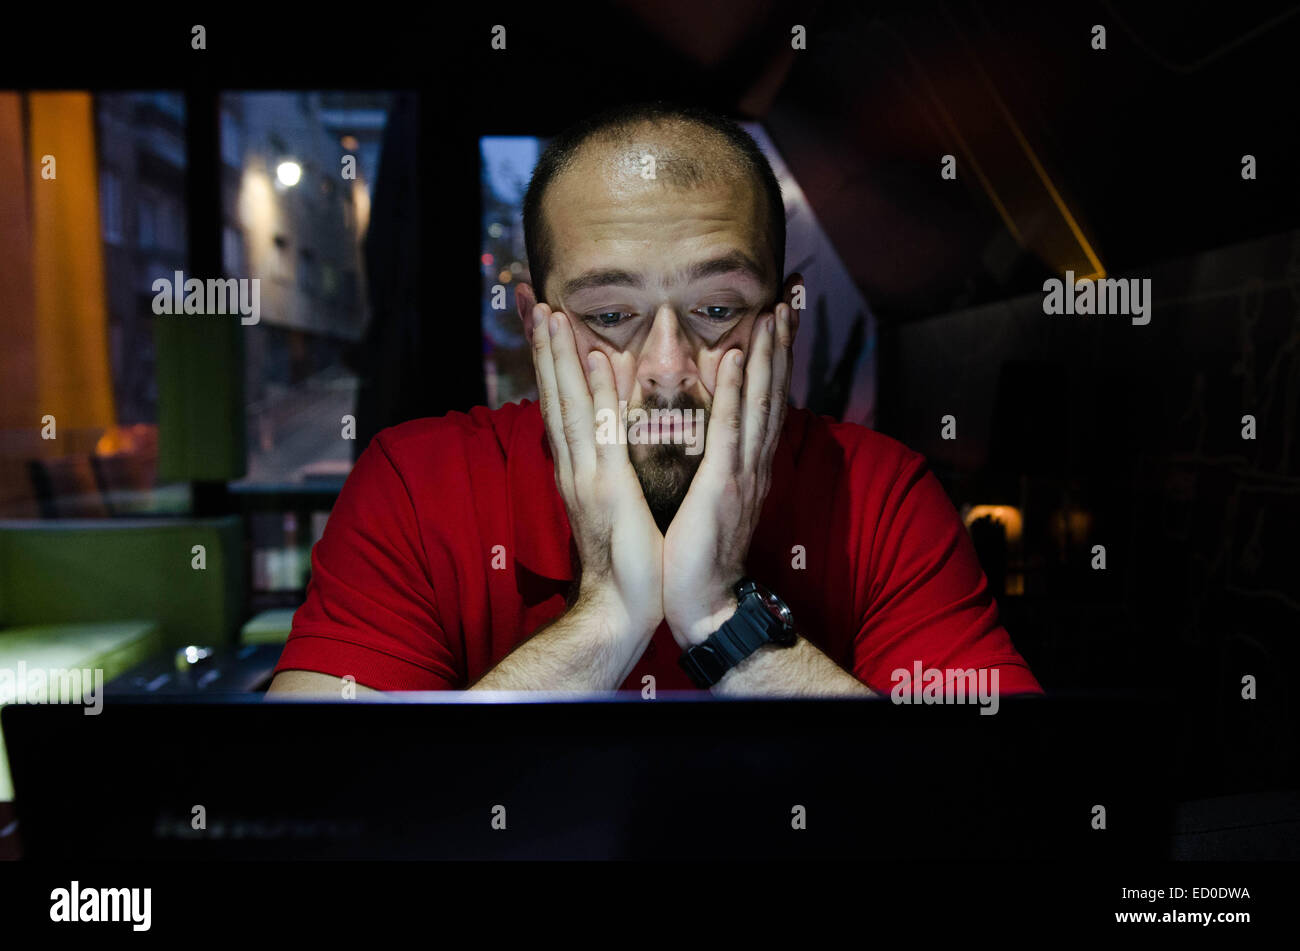 Homme assis et regardant at laptop Photo Stock